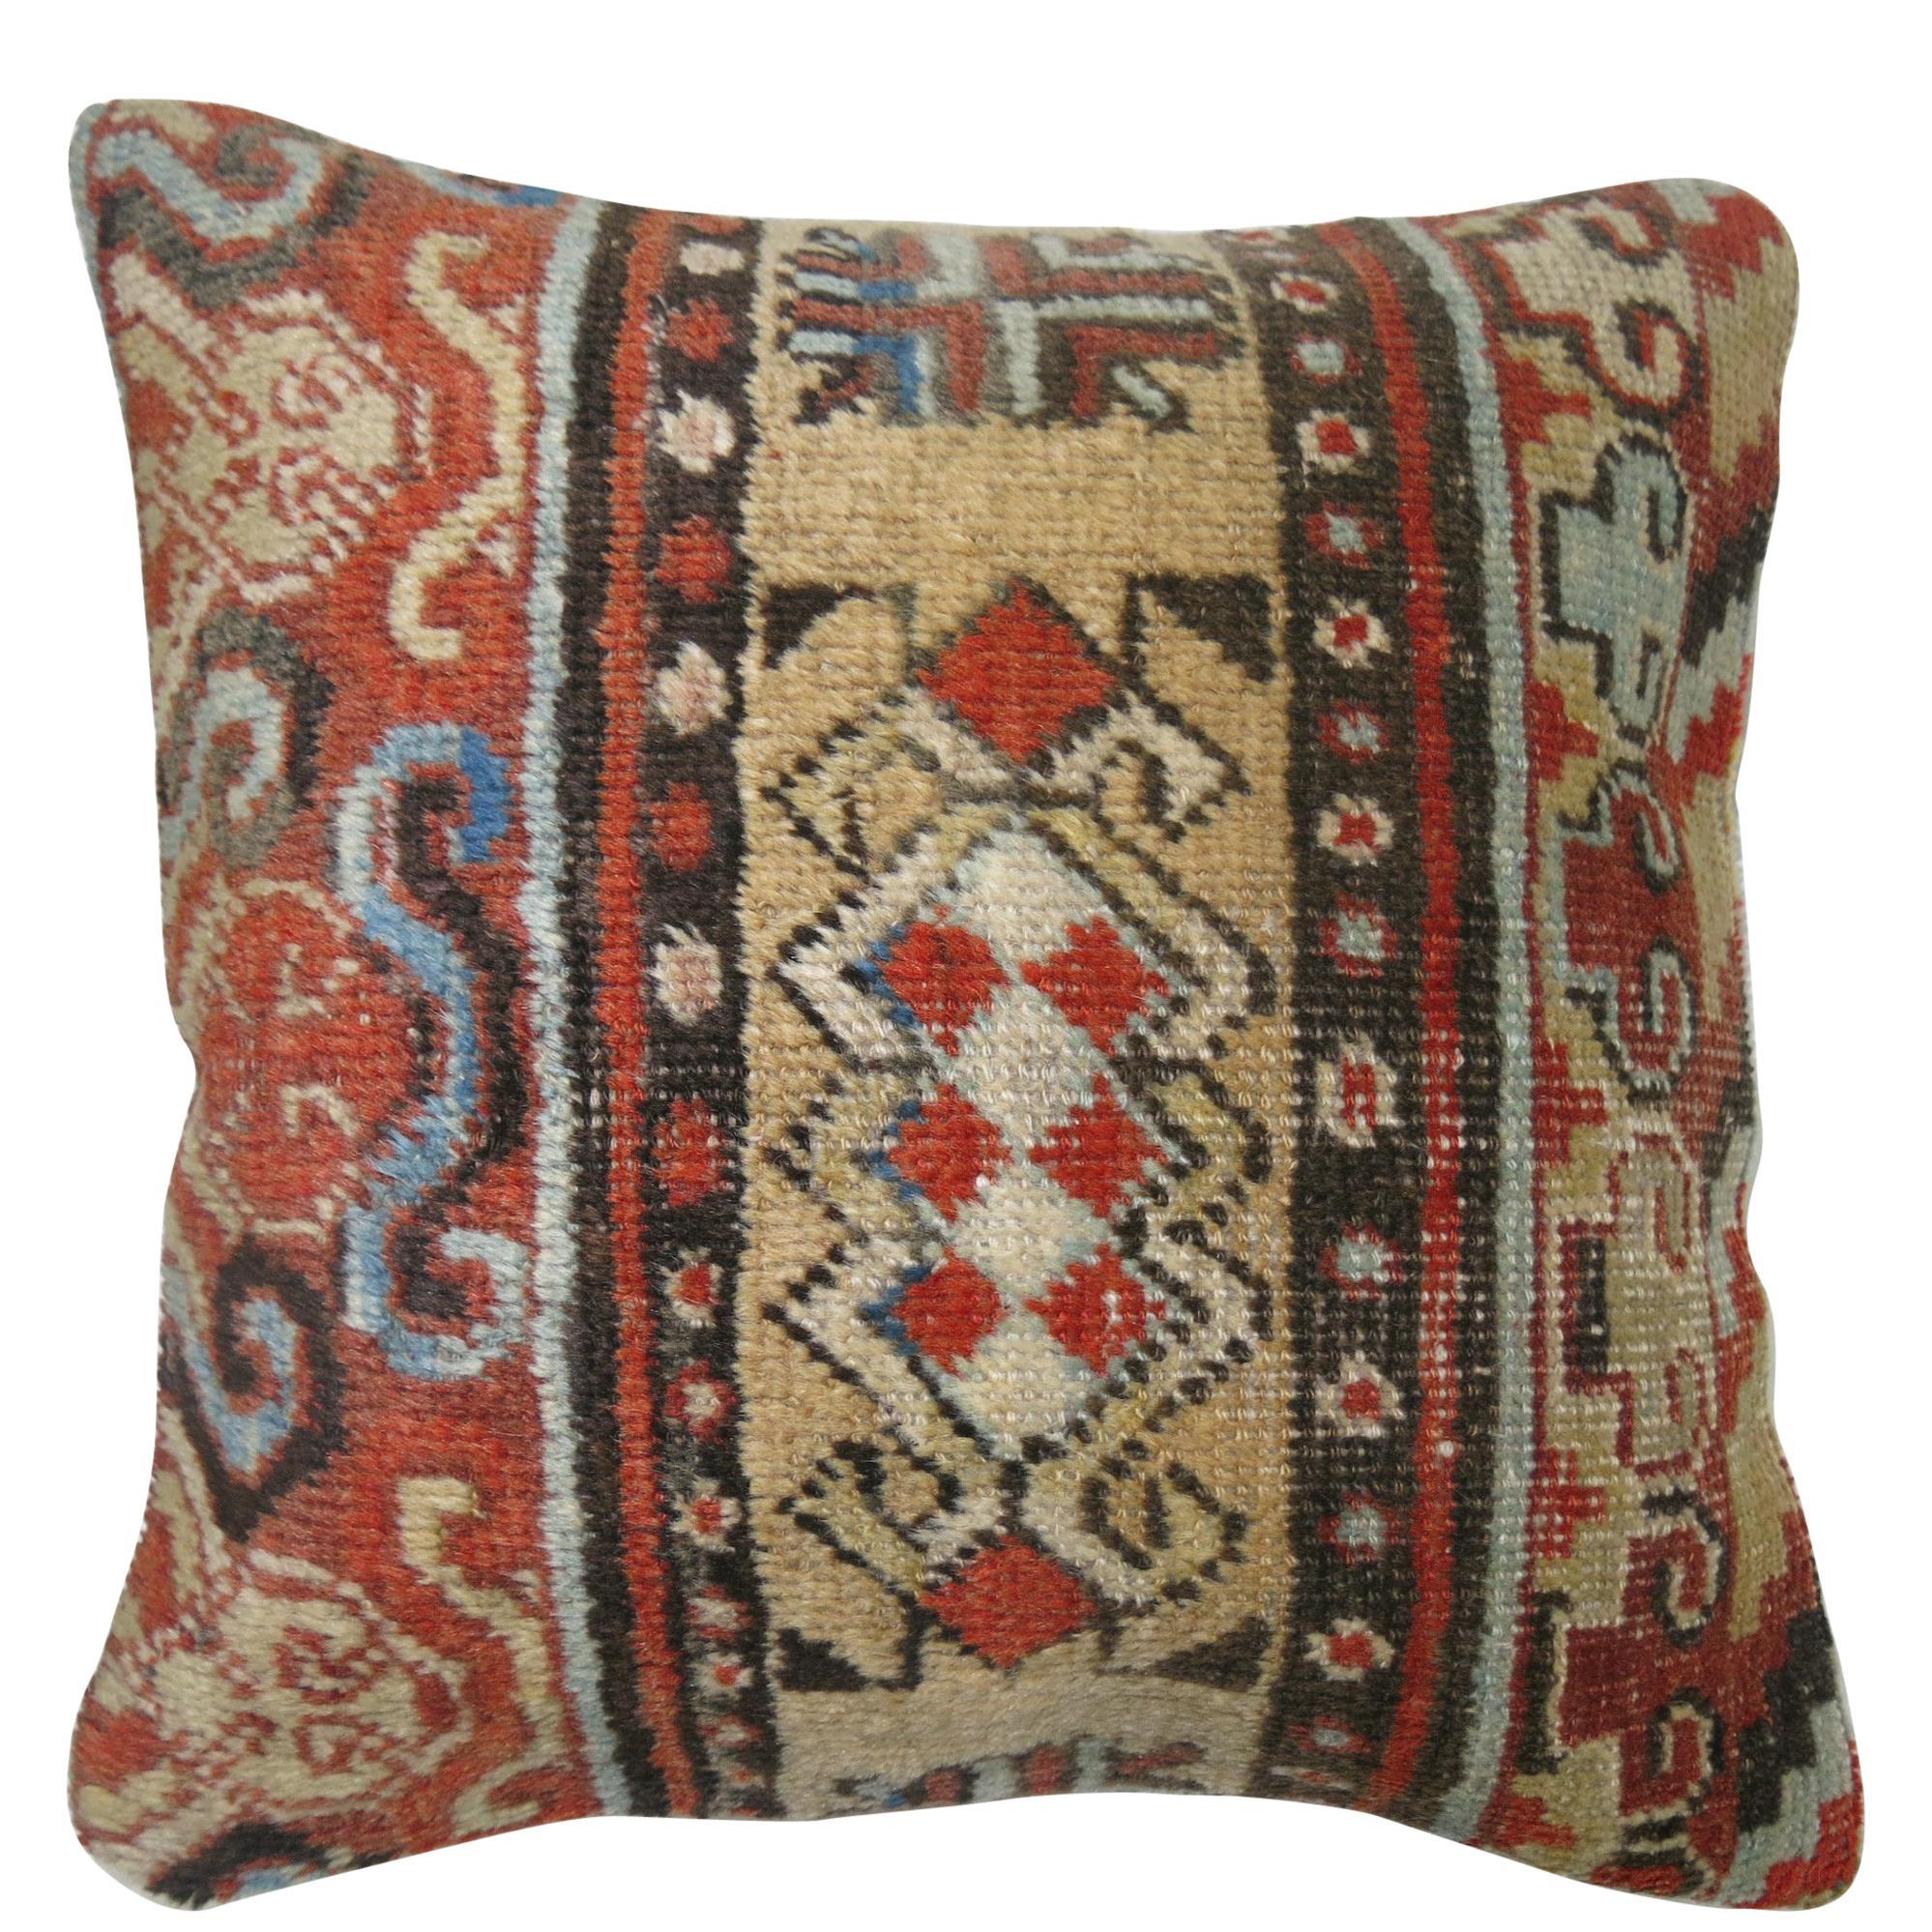 Rustic Antique Khotan Rug Pillow